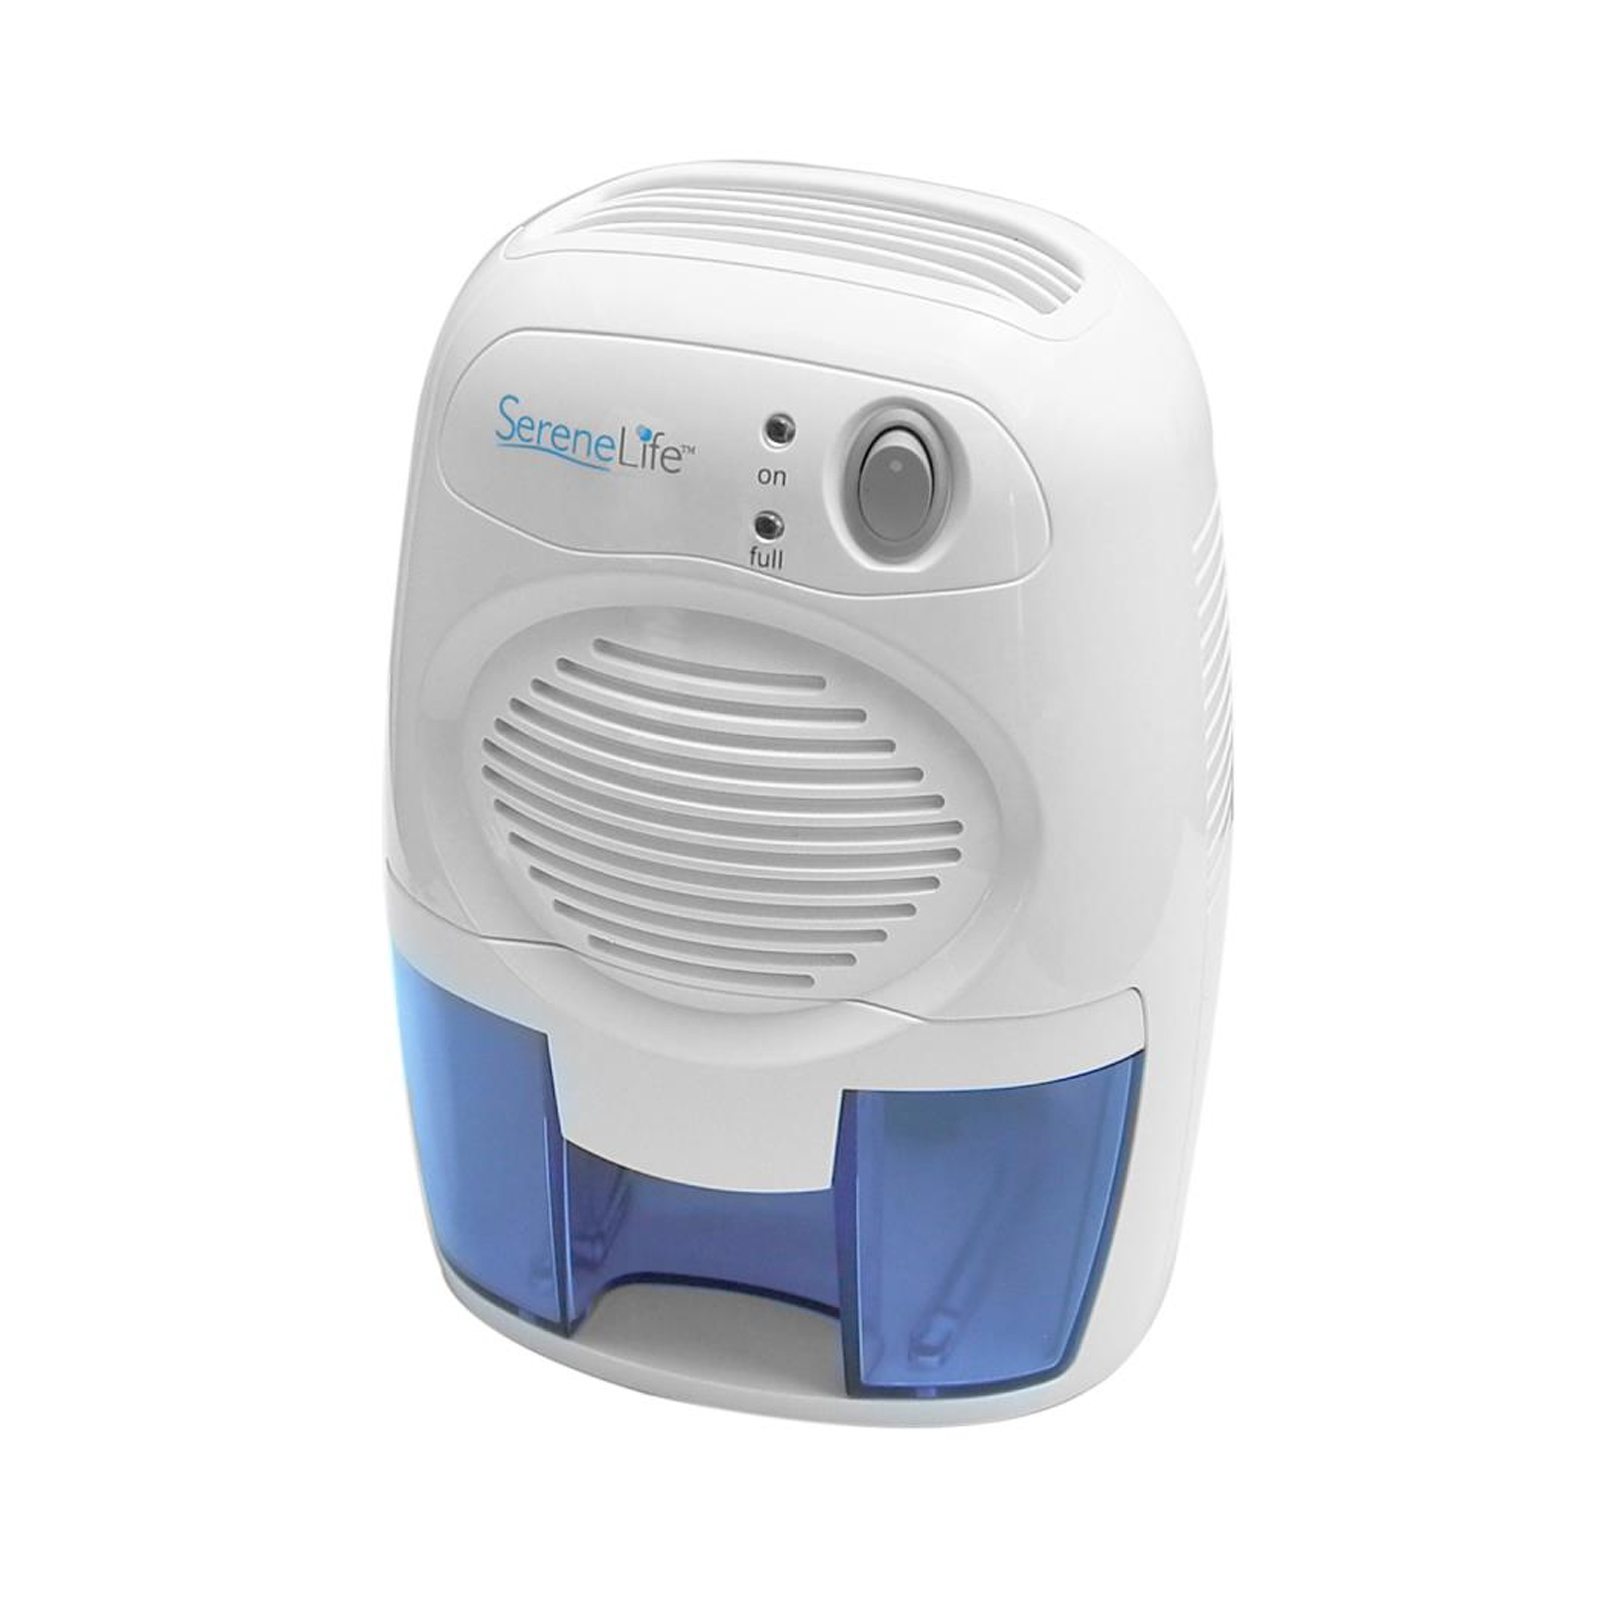 SereneLife Compact Electronic Dehumidifier Digital Mini ...